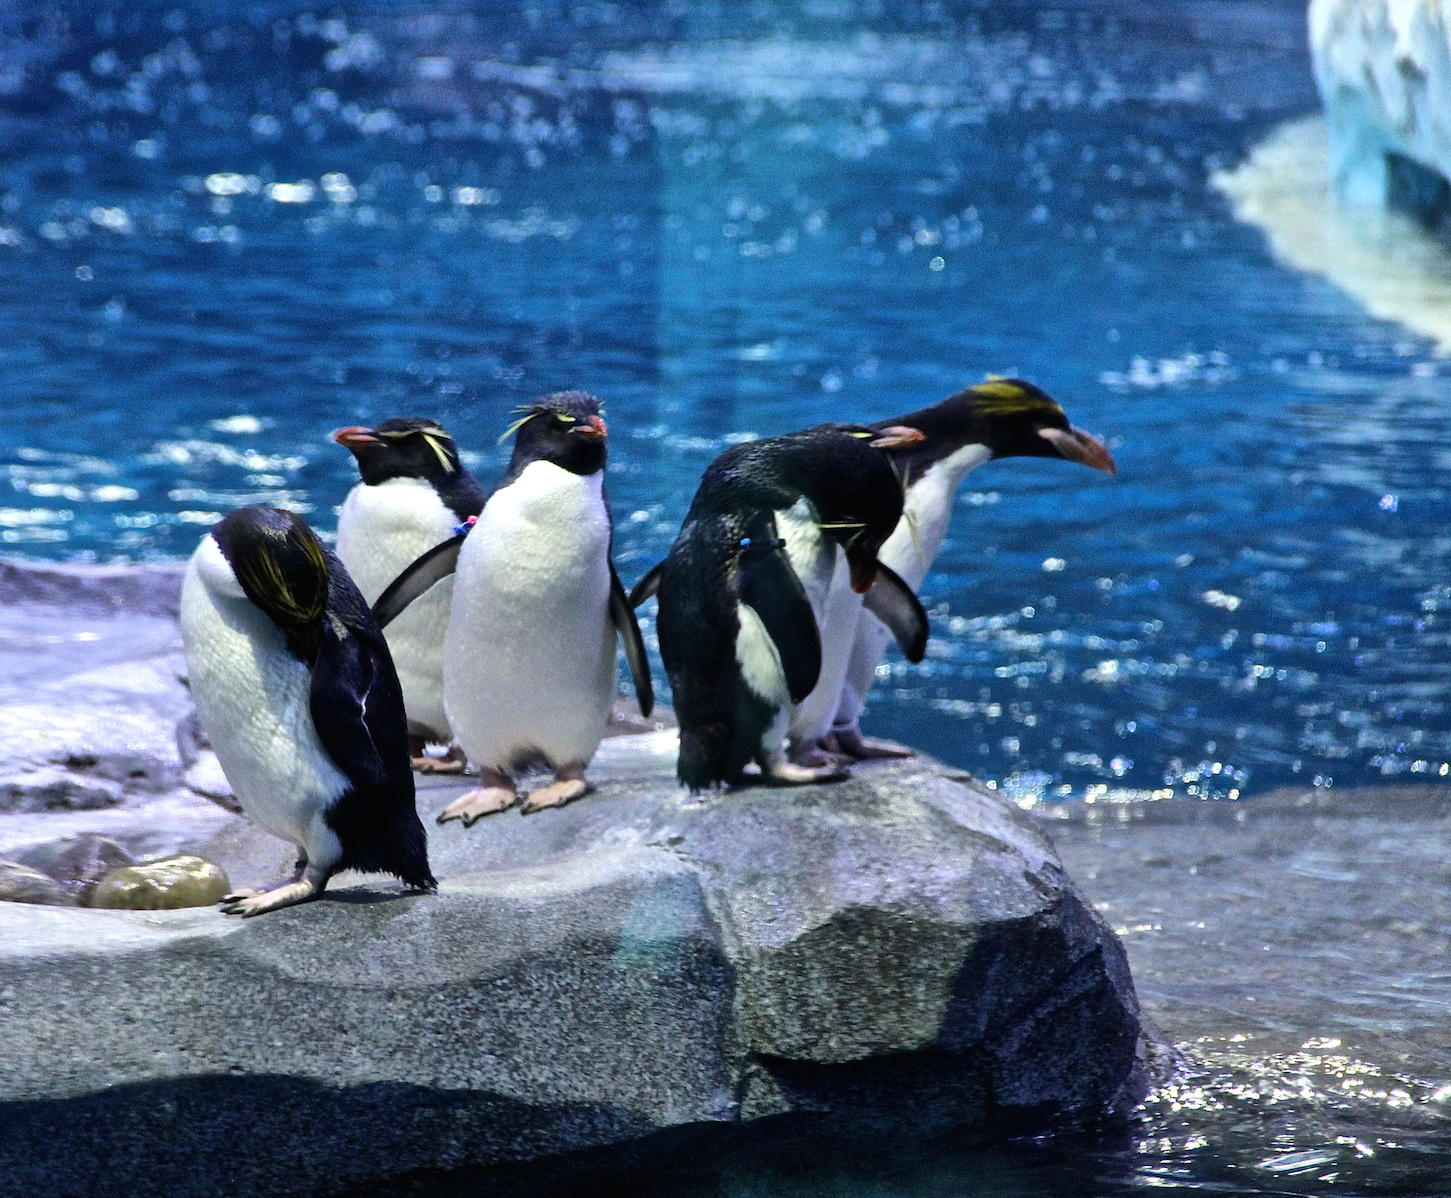 Zoo Penguin 2 Voice - Happy Feet (Movie) | Behind The ... |Happy Feet Zoo Aquarium